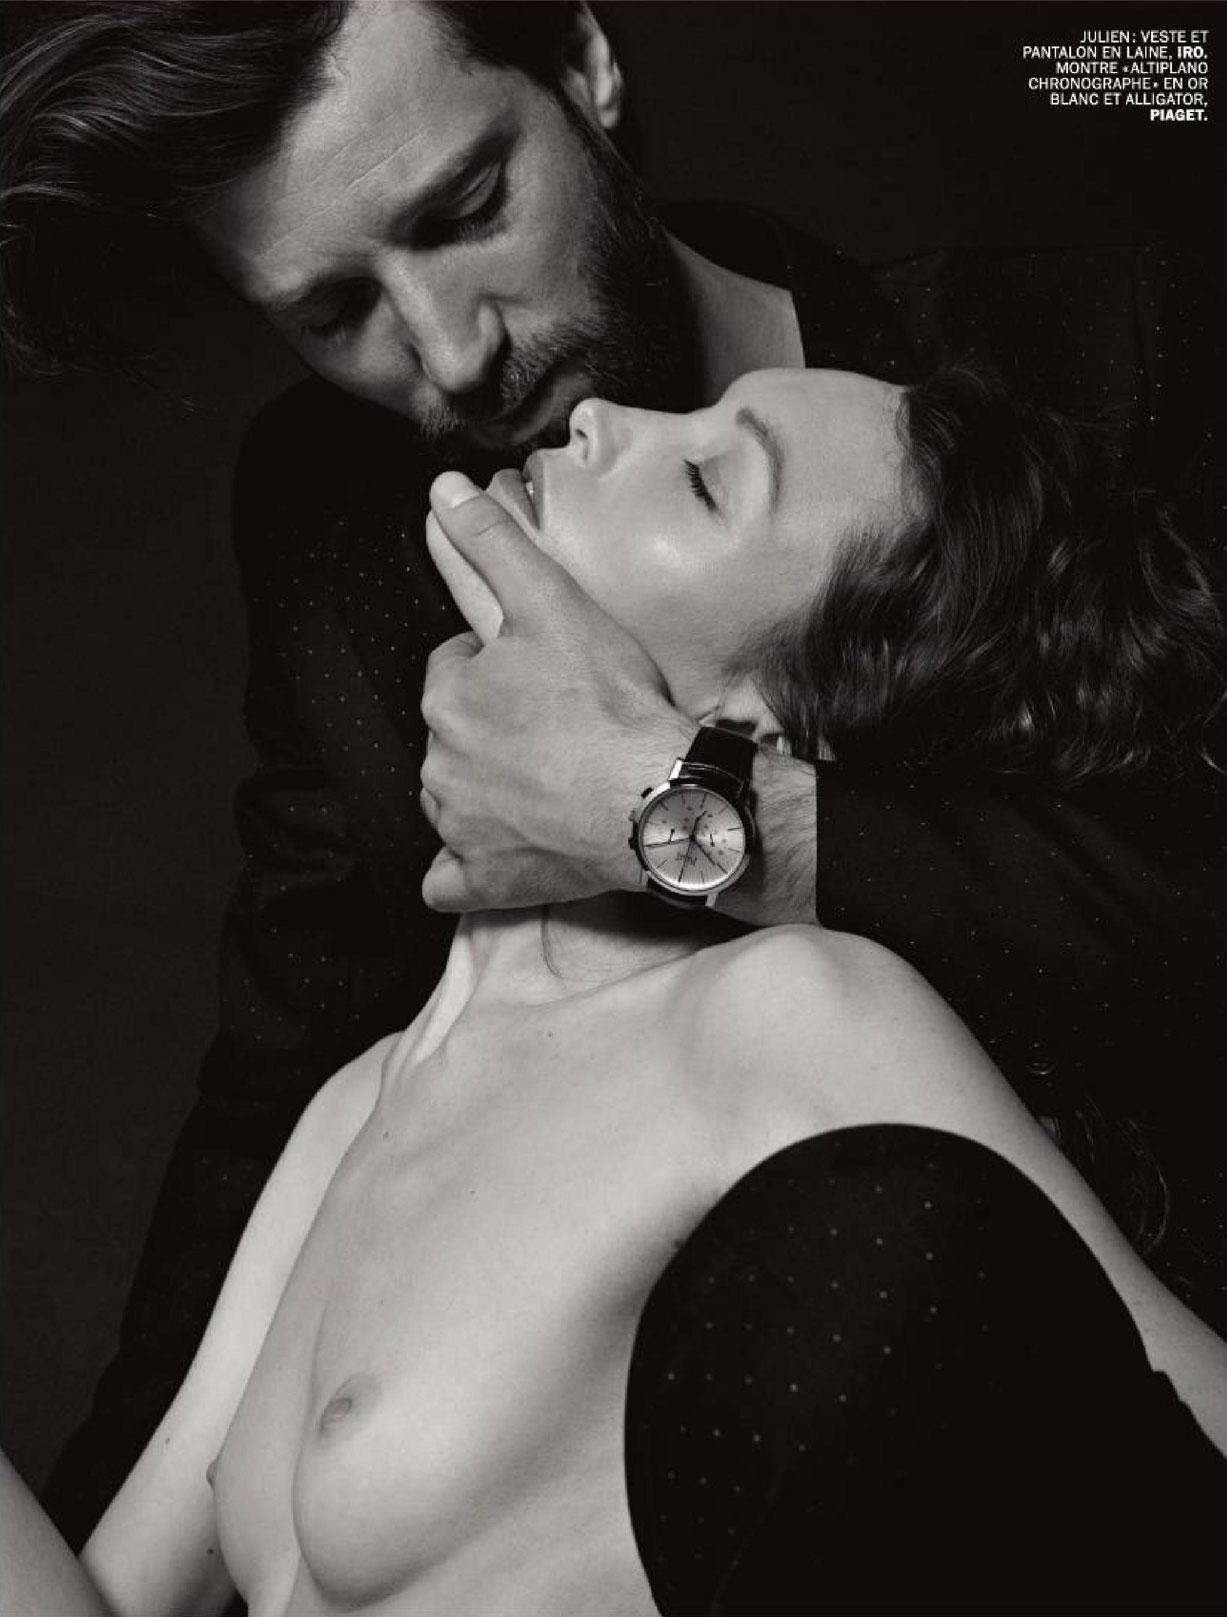 Julien Remond & Fanny Fournier by Serge Paulet - Lui Magazine may 2016